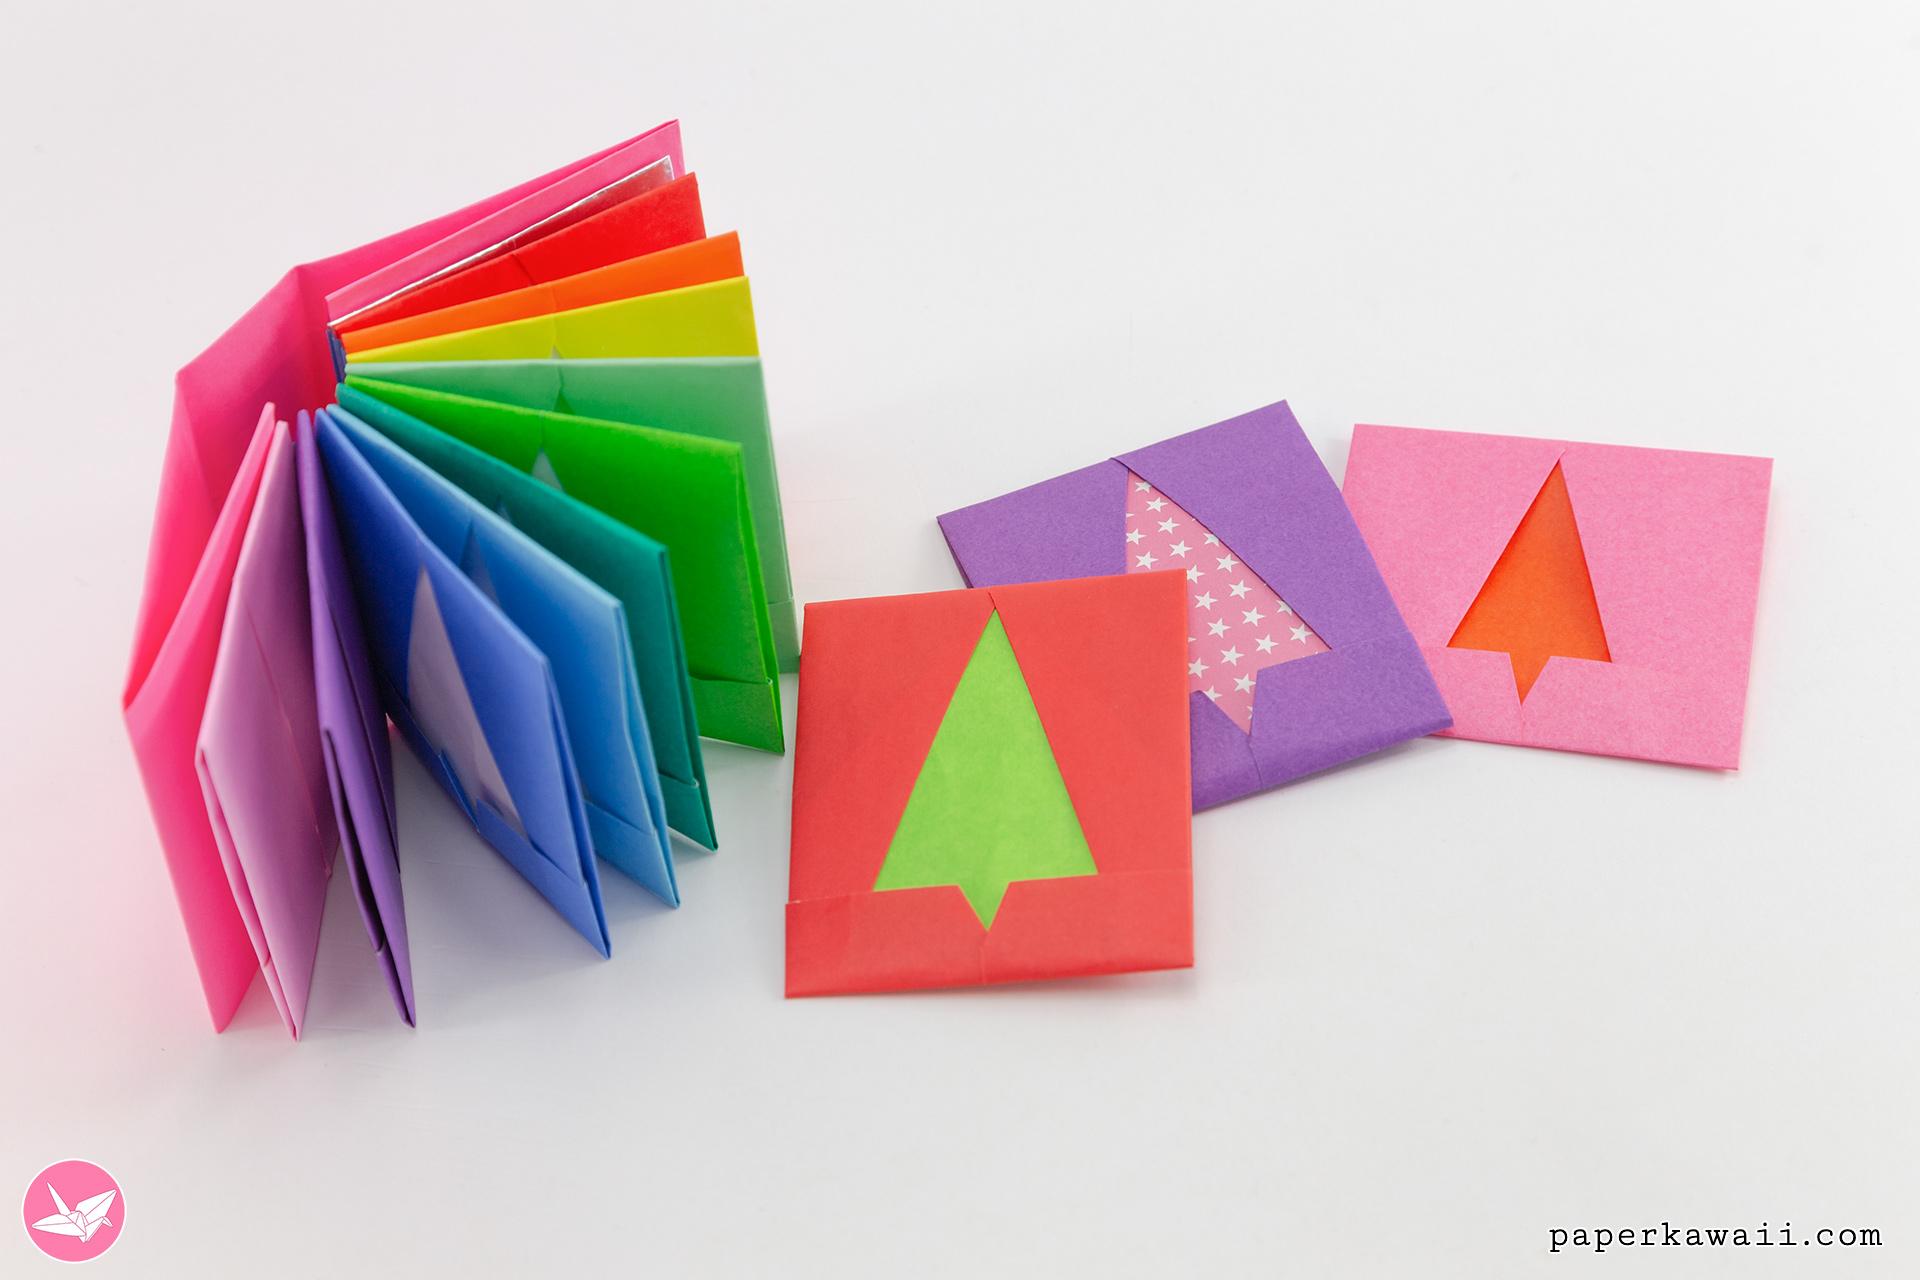 Origami Christmas Tree Envelope Tutorial - & Gift Book via @paper_kawaii